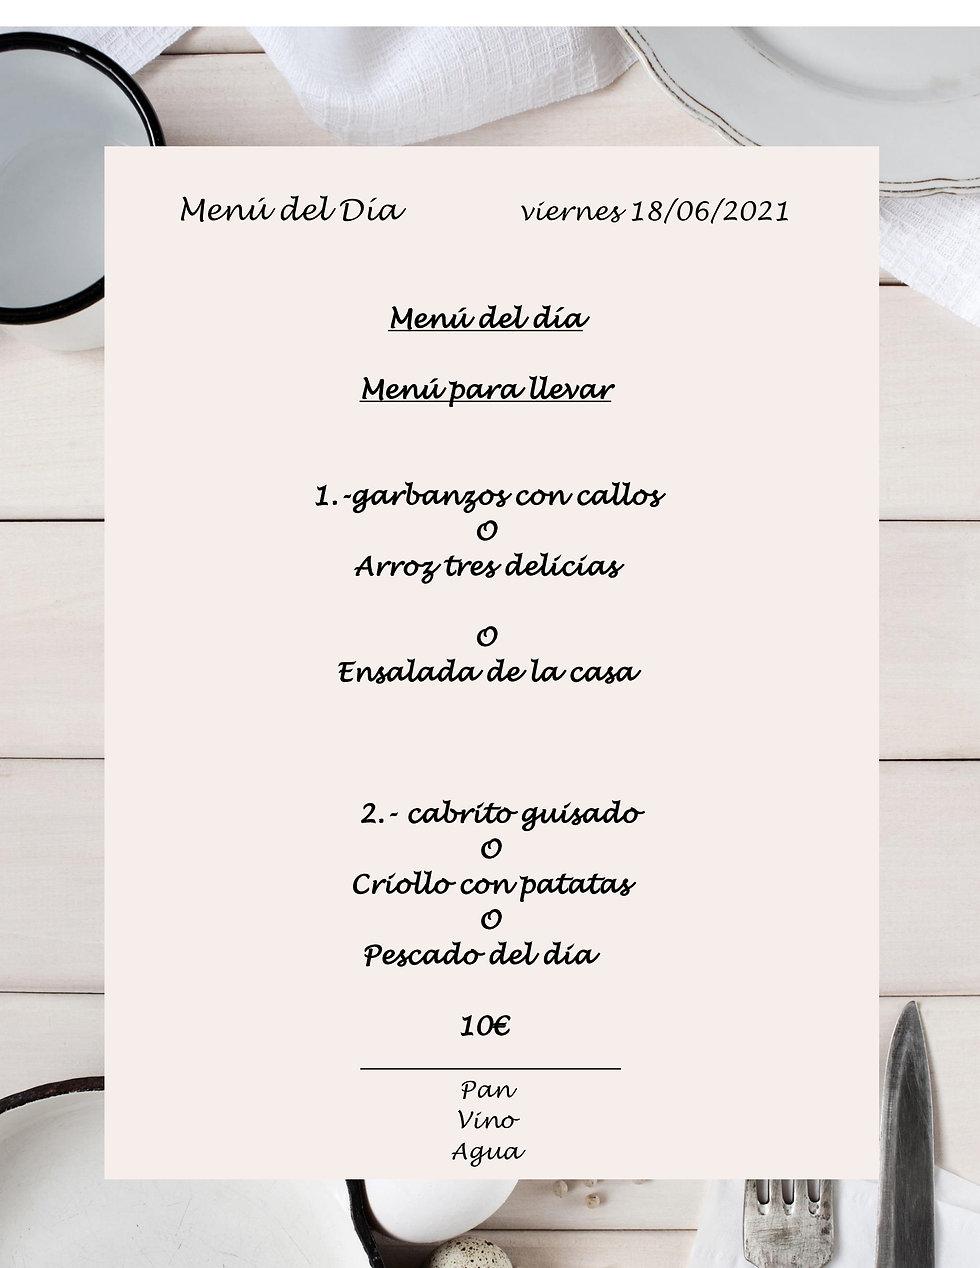 menu 18 jpg.jpg